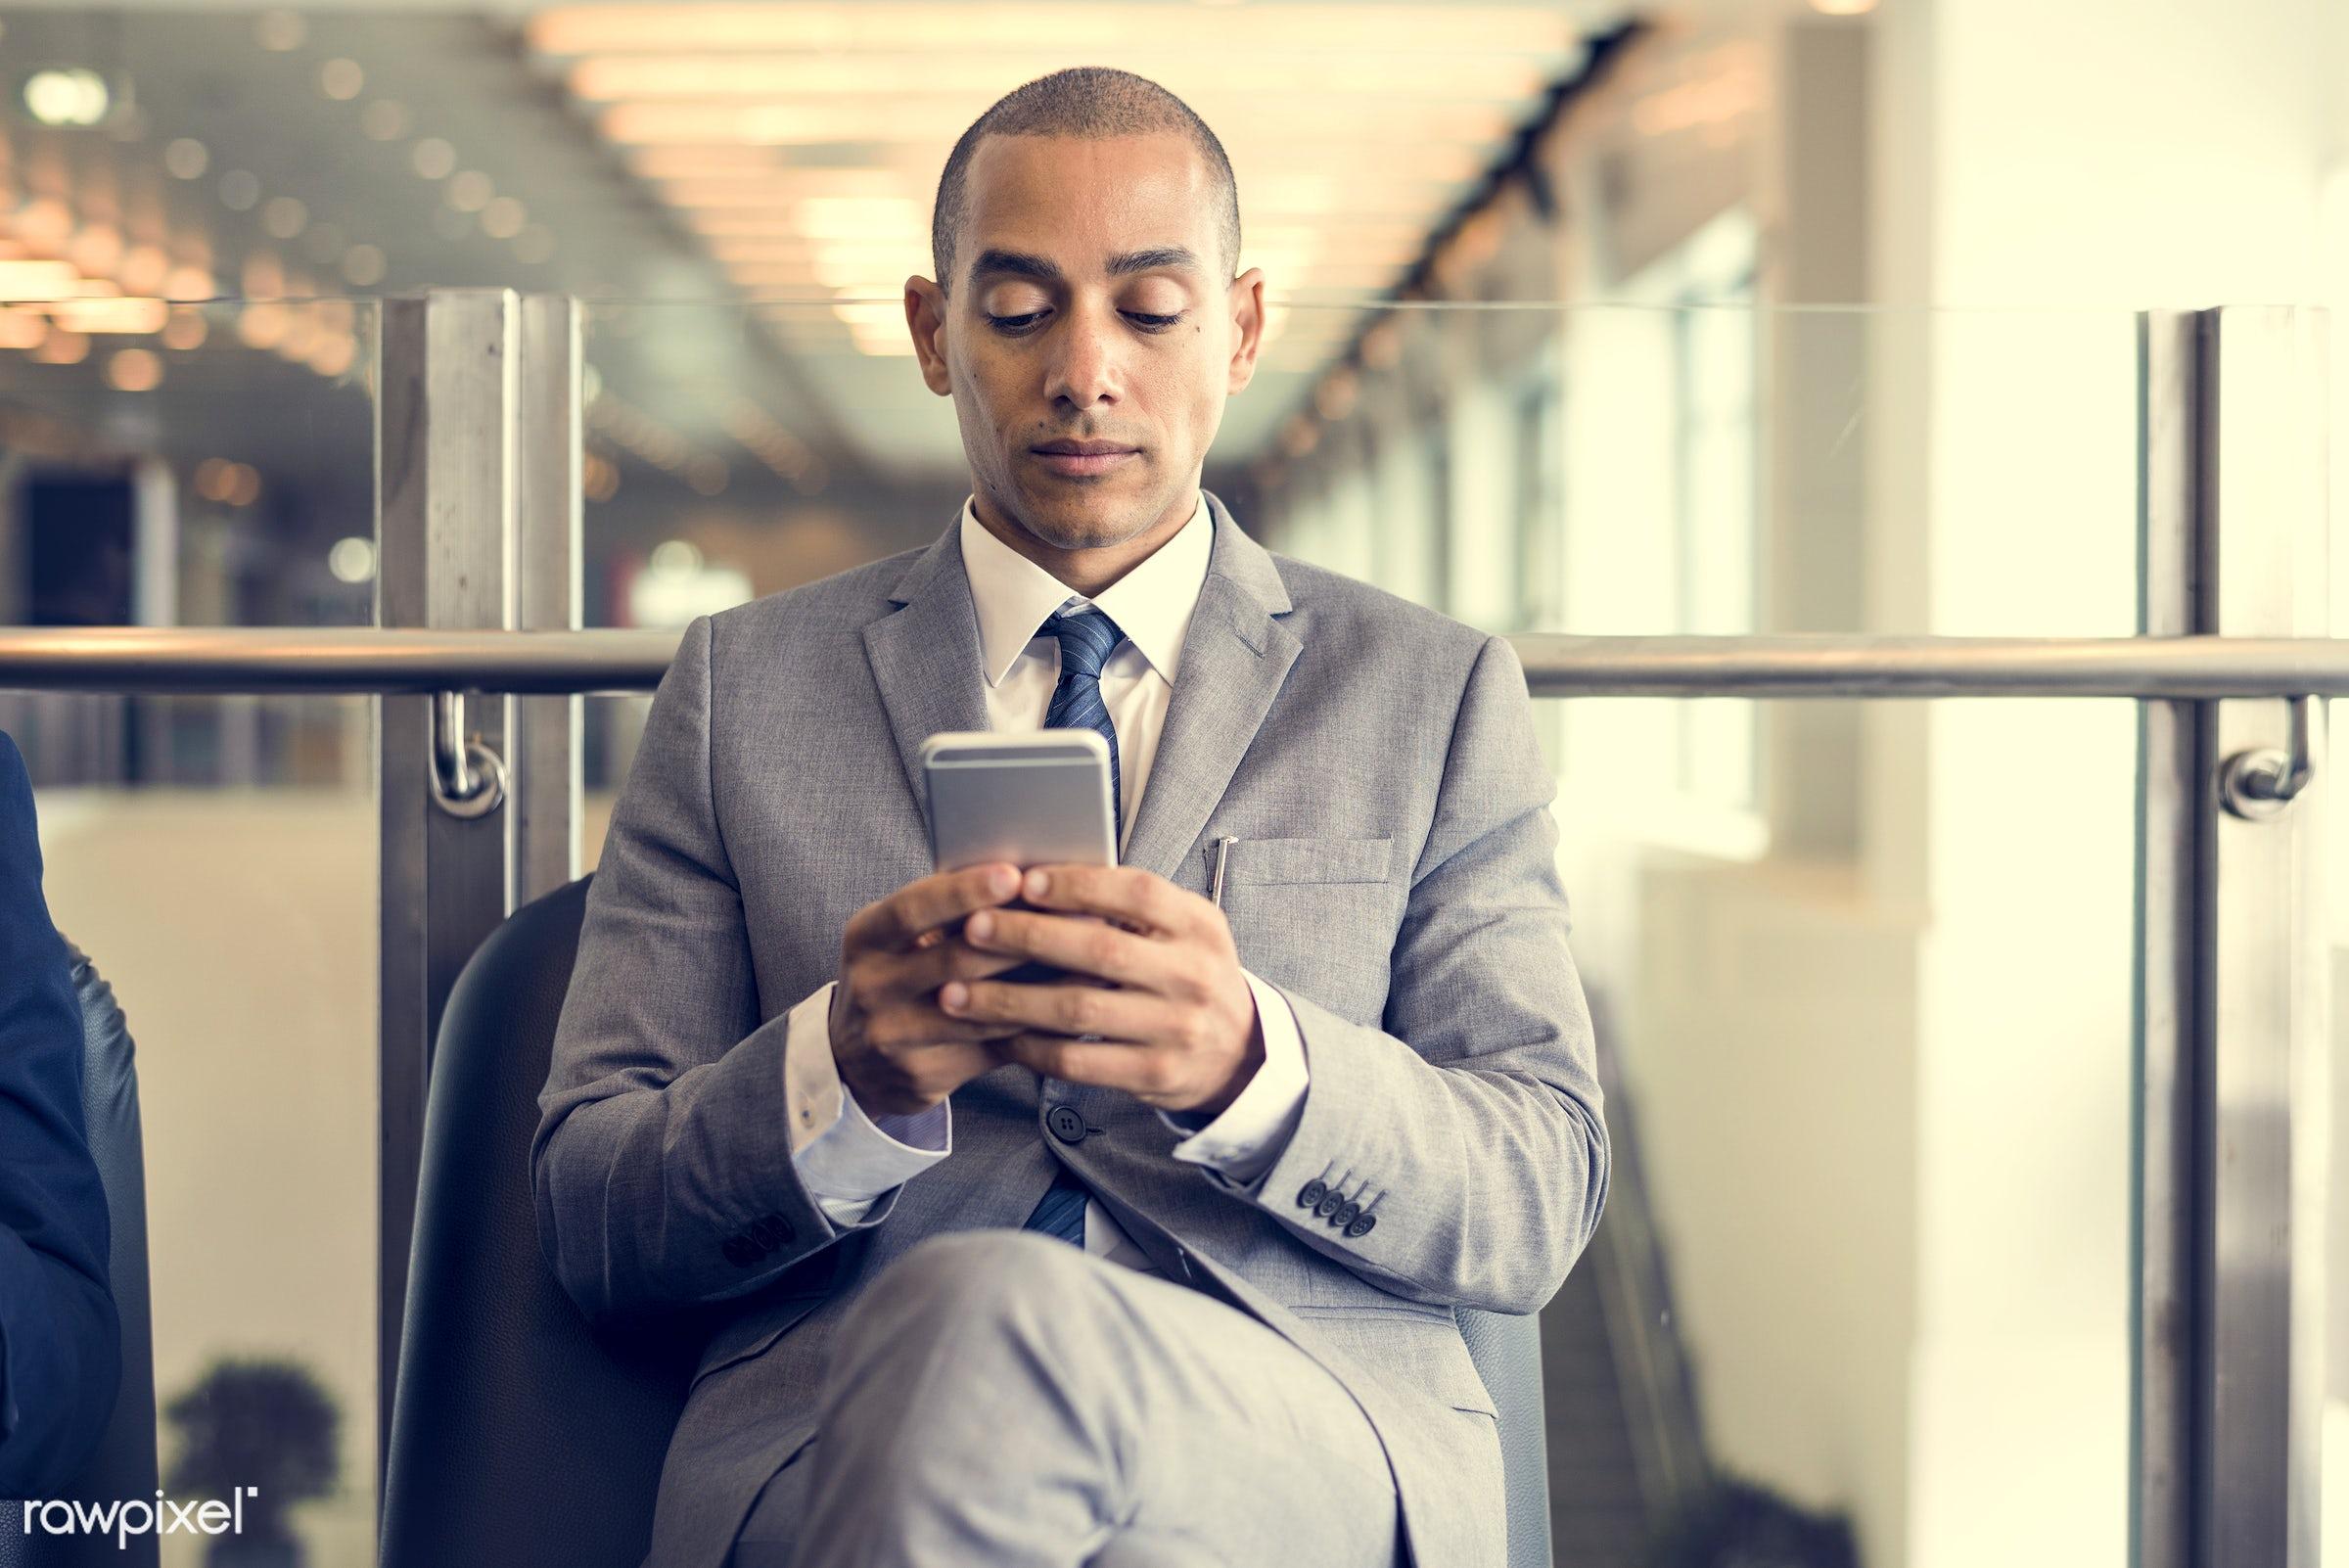 adult, break, business, businessman, businessmen, candid, cellphone, chairs, communication, corporate, device, digital...